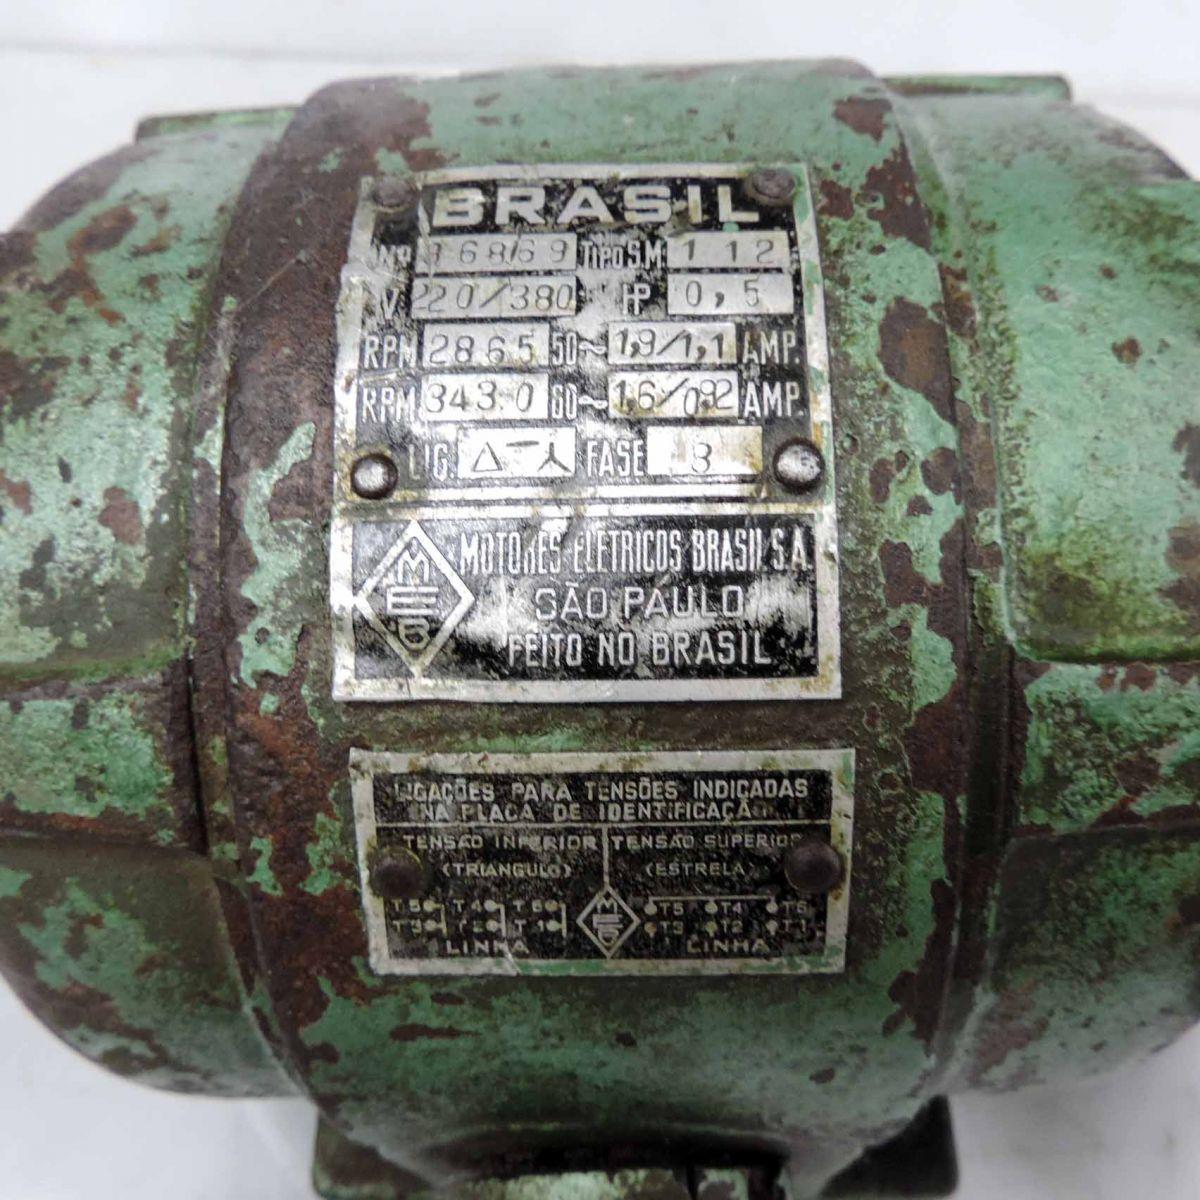 Motor Trifásico 0,5 hp 3430 rpm Com Hélice Marca Brasil F2 - Usado